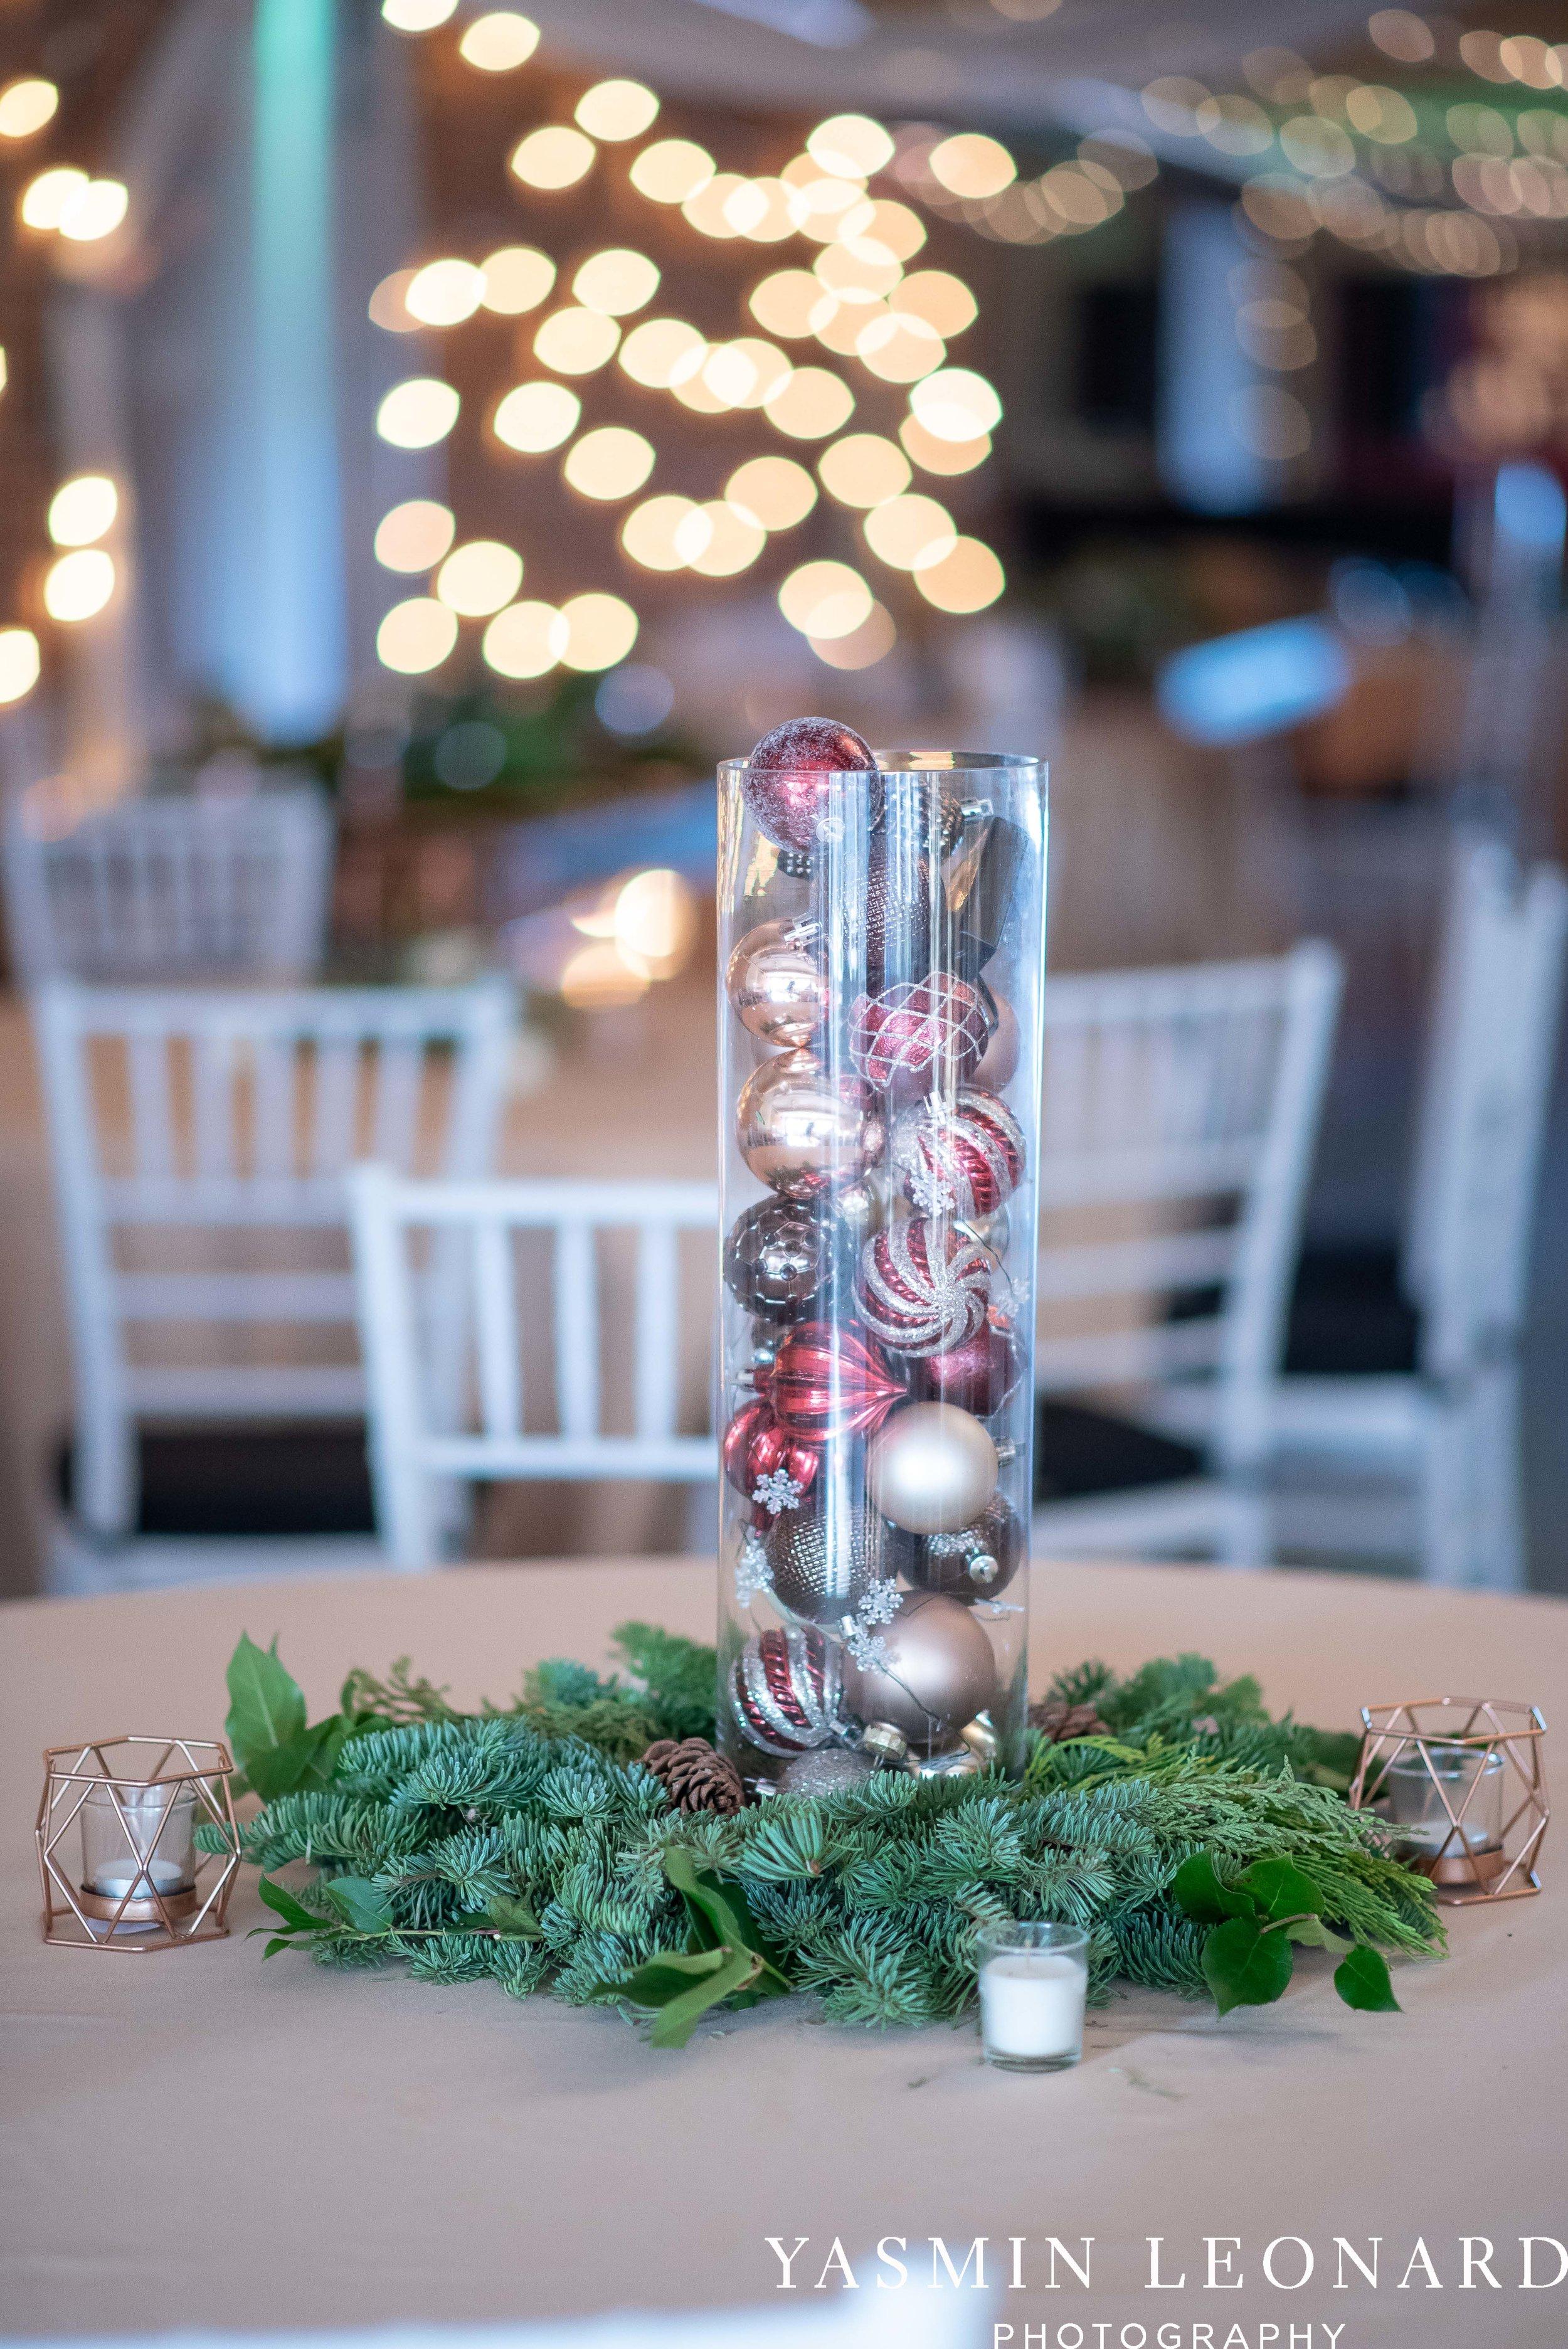 Rebekah and Matt - 105 Worth Event Centre - Yasmin Leonard Photography - Asheboro Wedding - NC Wedding - High Point Weddings - Triad Weddings - Winter Wedding-46.jpg